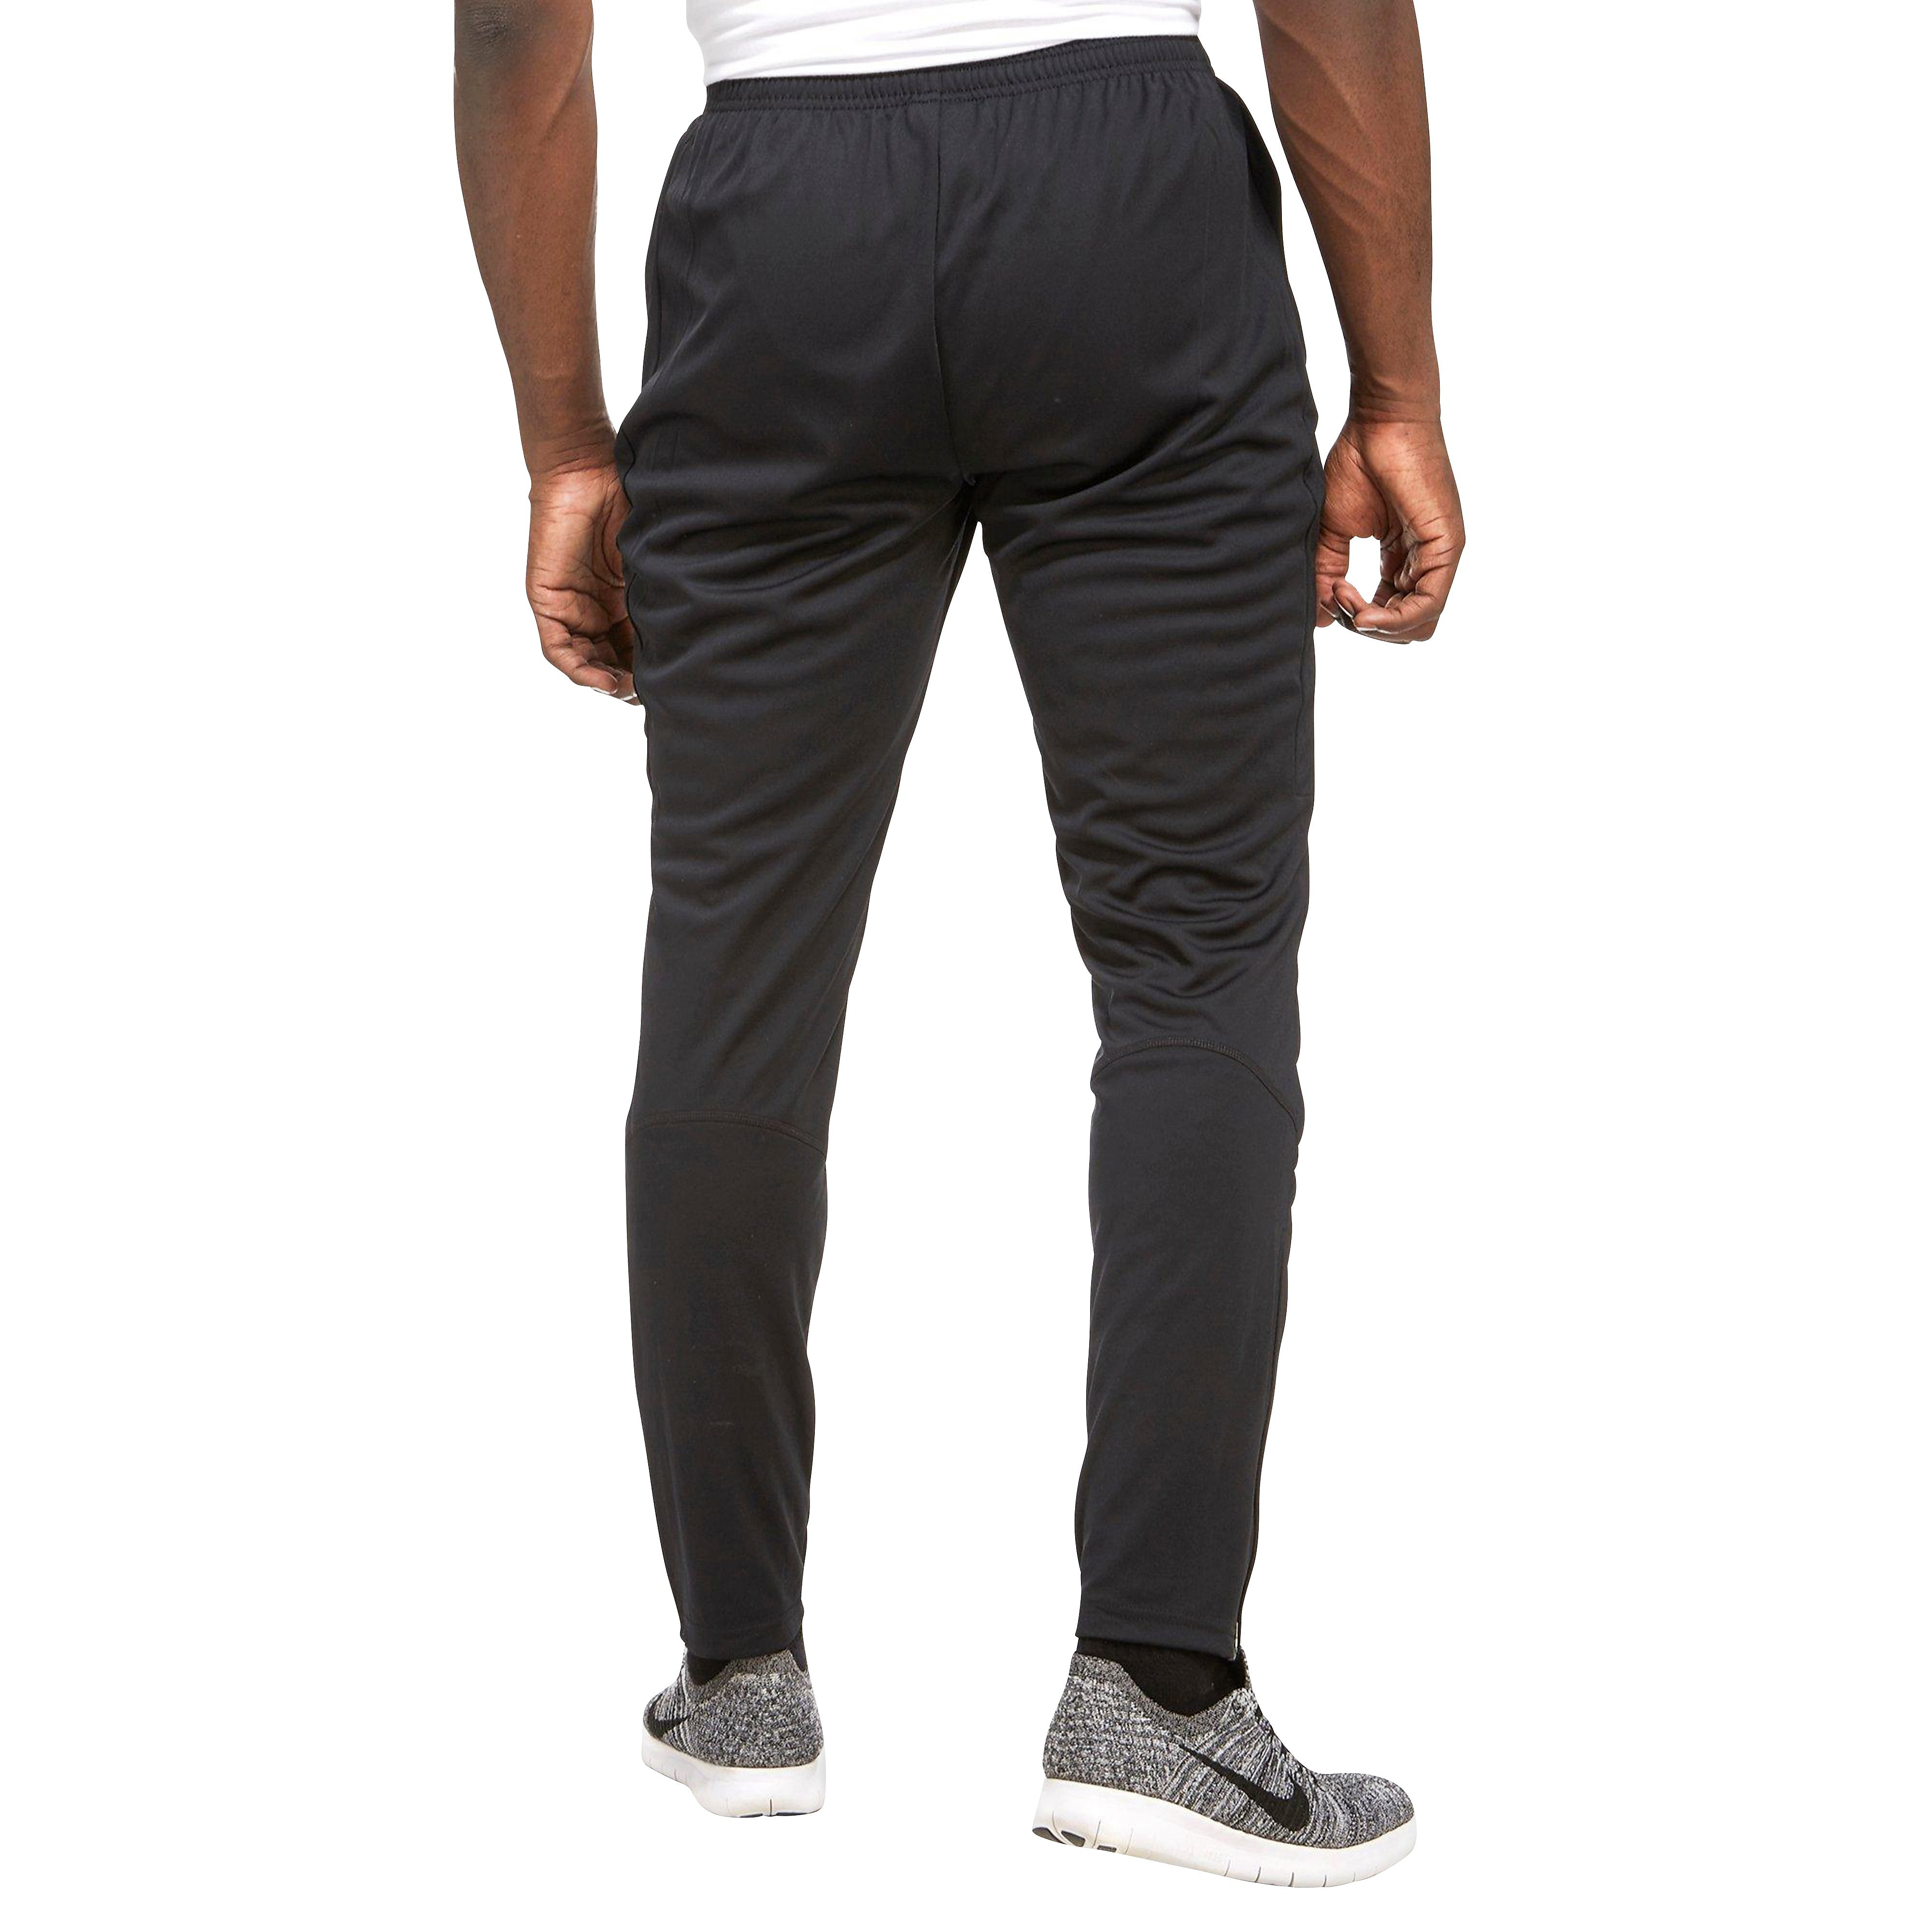 Nike Academy 17 Men's Football Pants